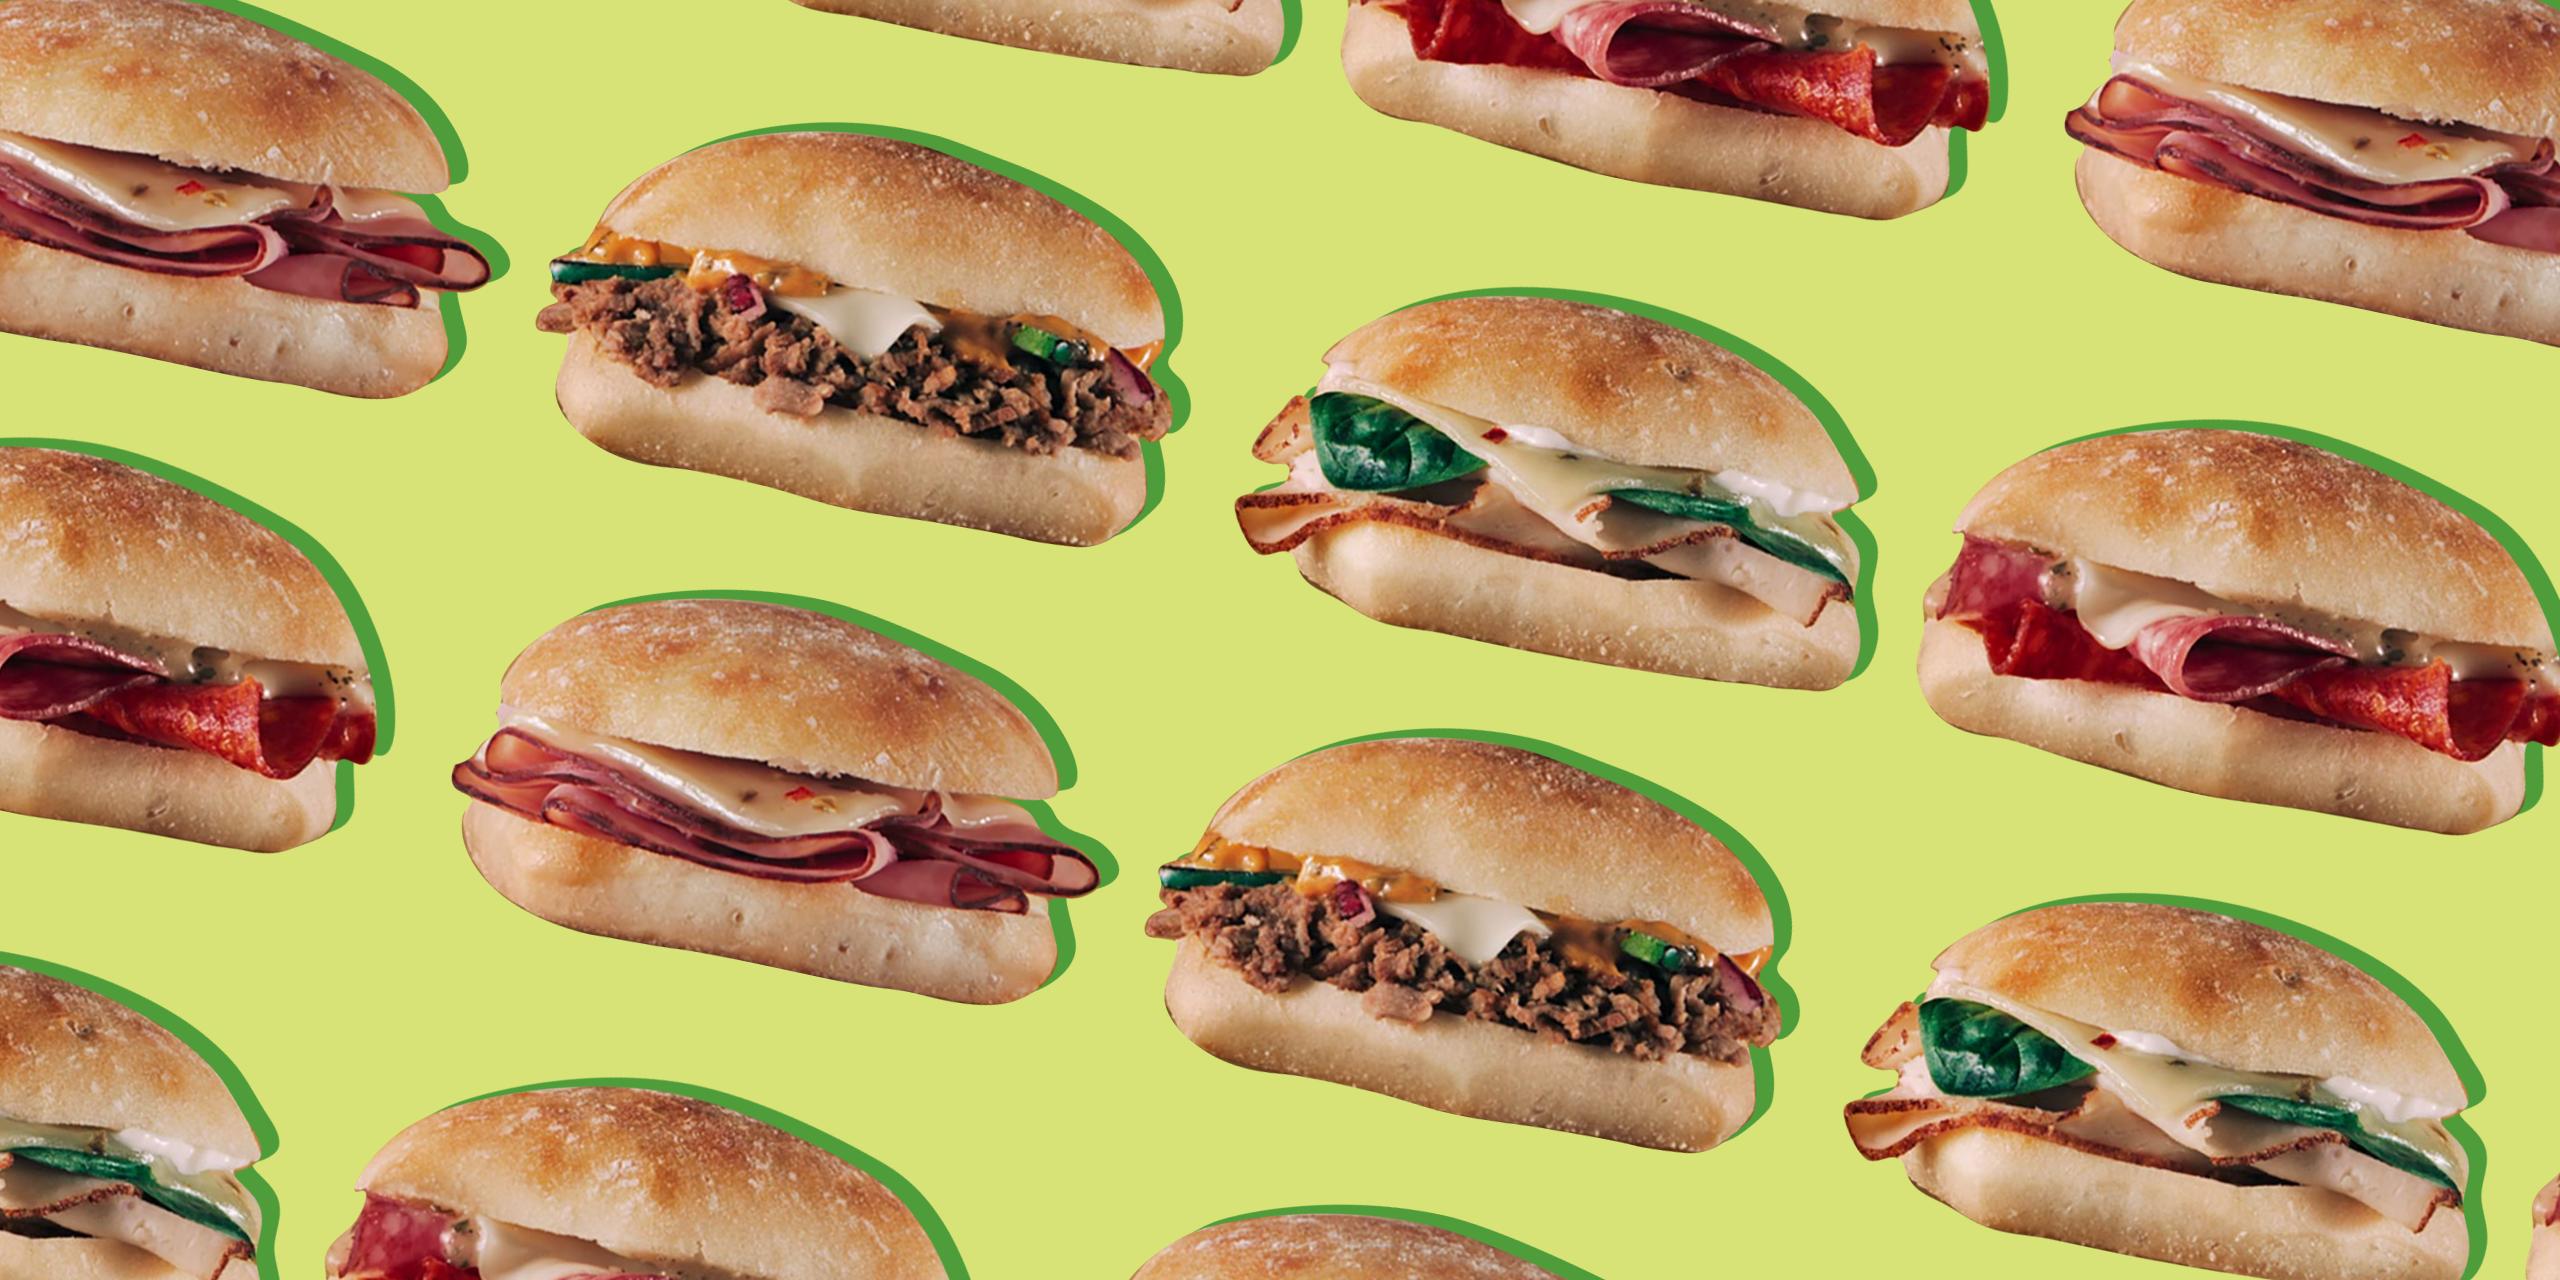 Subway Sliders Nutrition & Calories